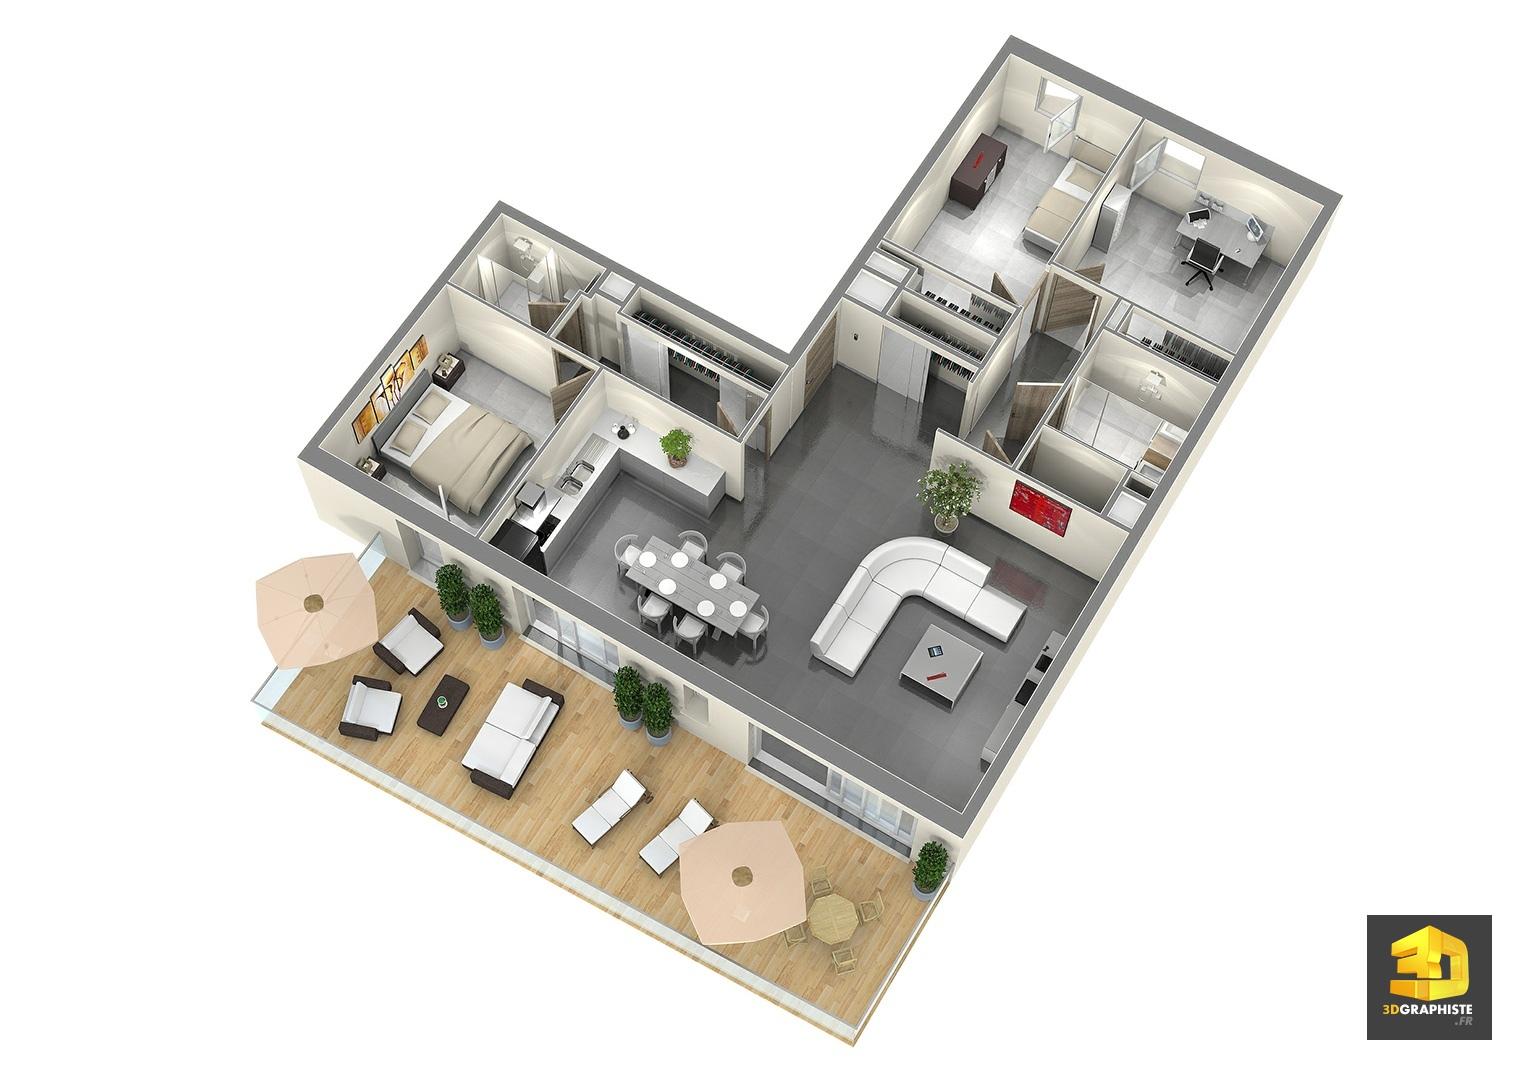 plan de vente t4 perspectiviste 3d 3dgraphiste fr. Black Bedroom Furniture Sets. Home Design Ideas